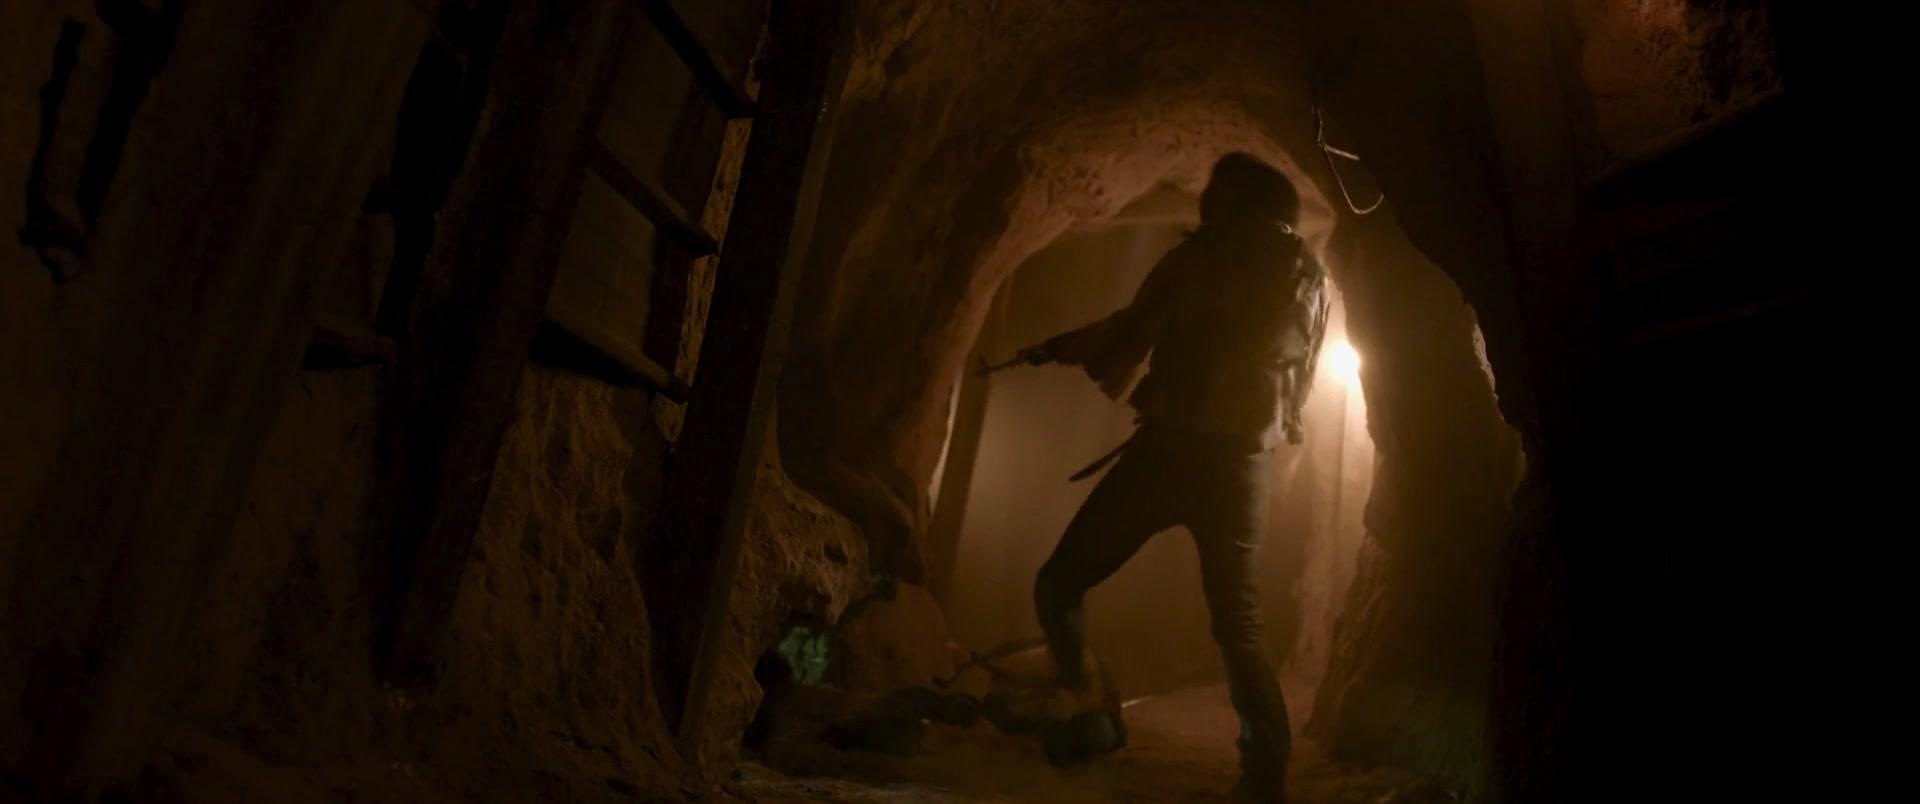 Rambo Last Blood (2019) 1080p BluRay x264 [Dual Audio][Hindi+English]-LHD